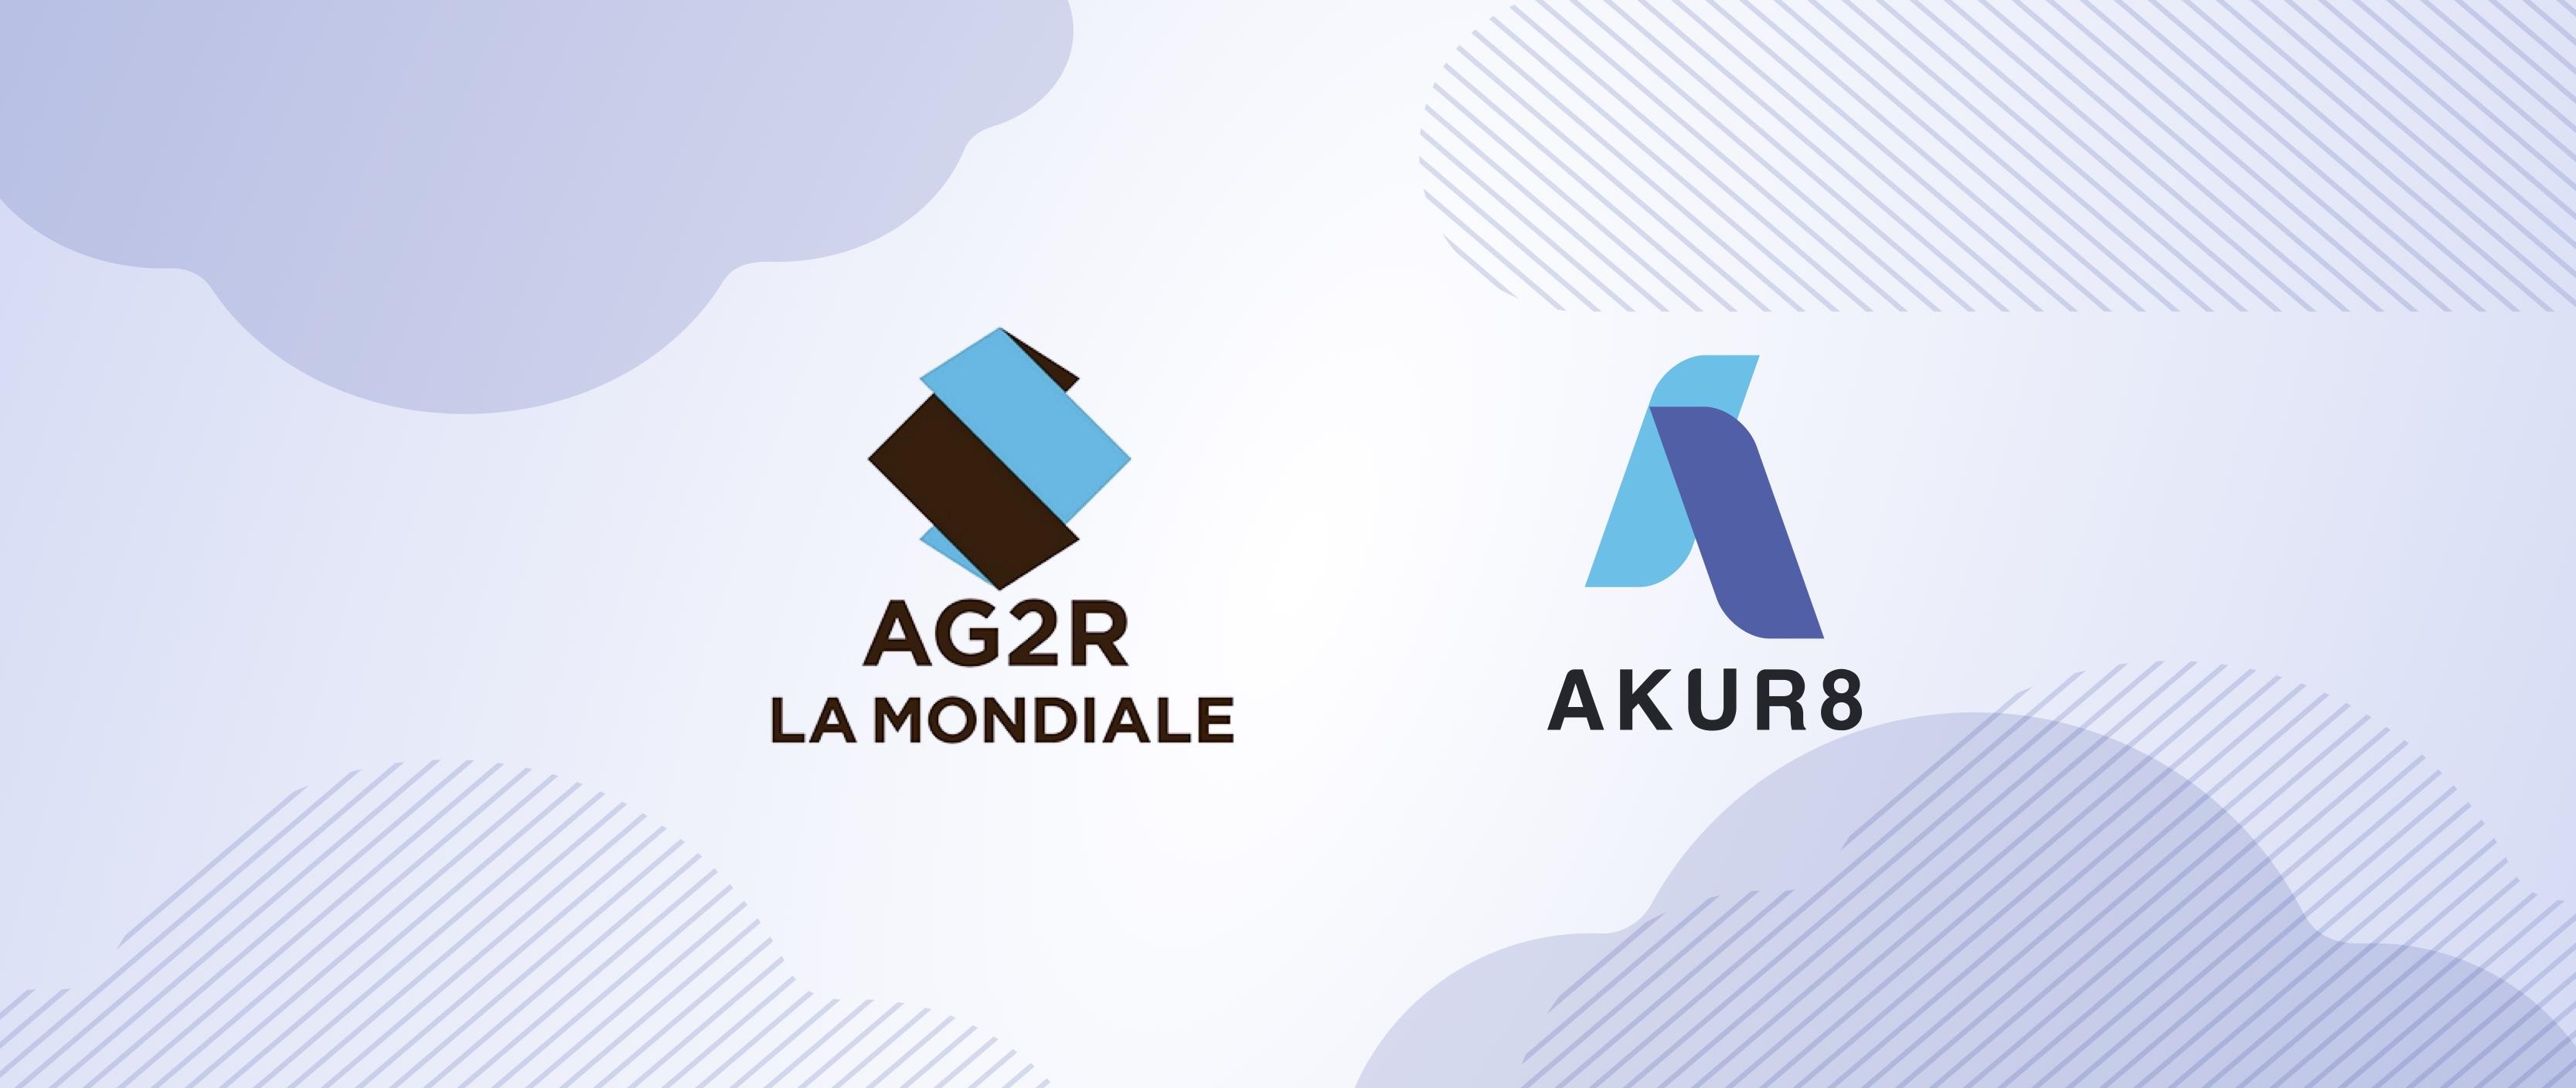 AG2R and Akur8's logos